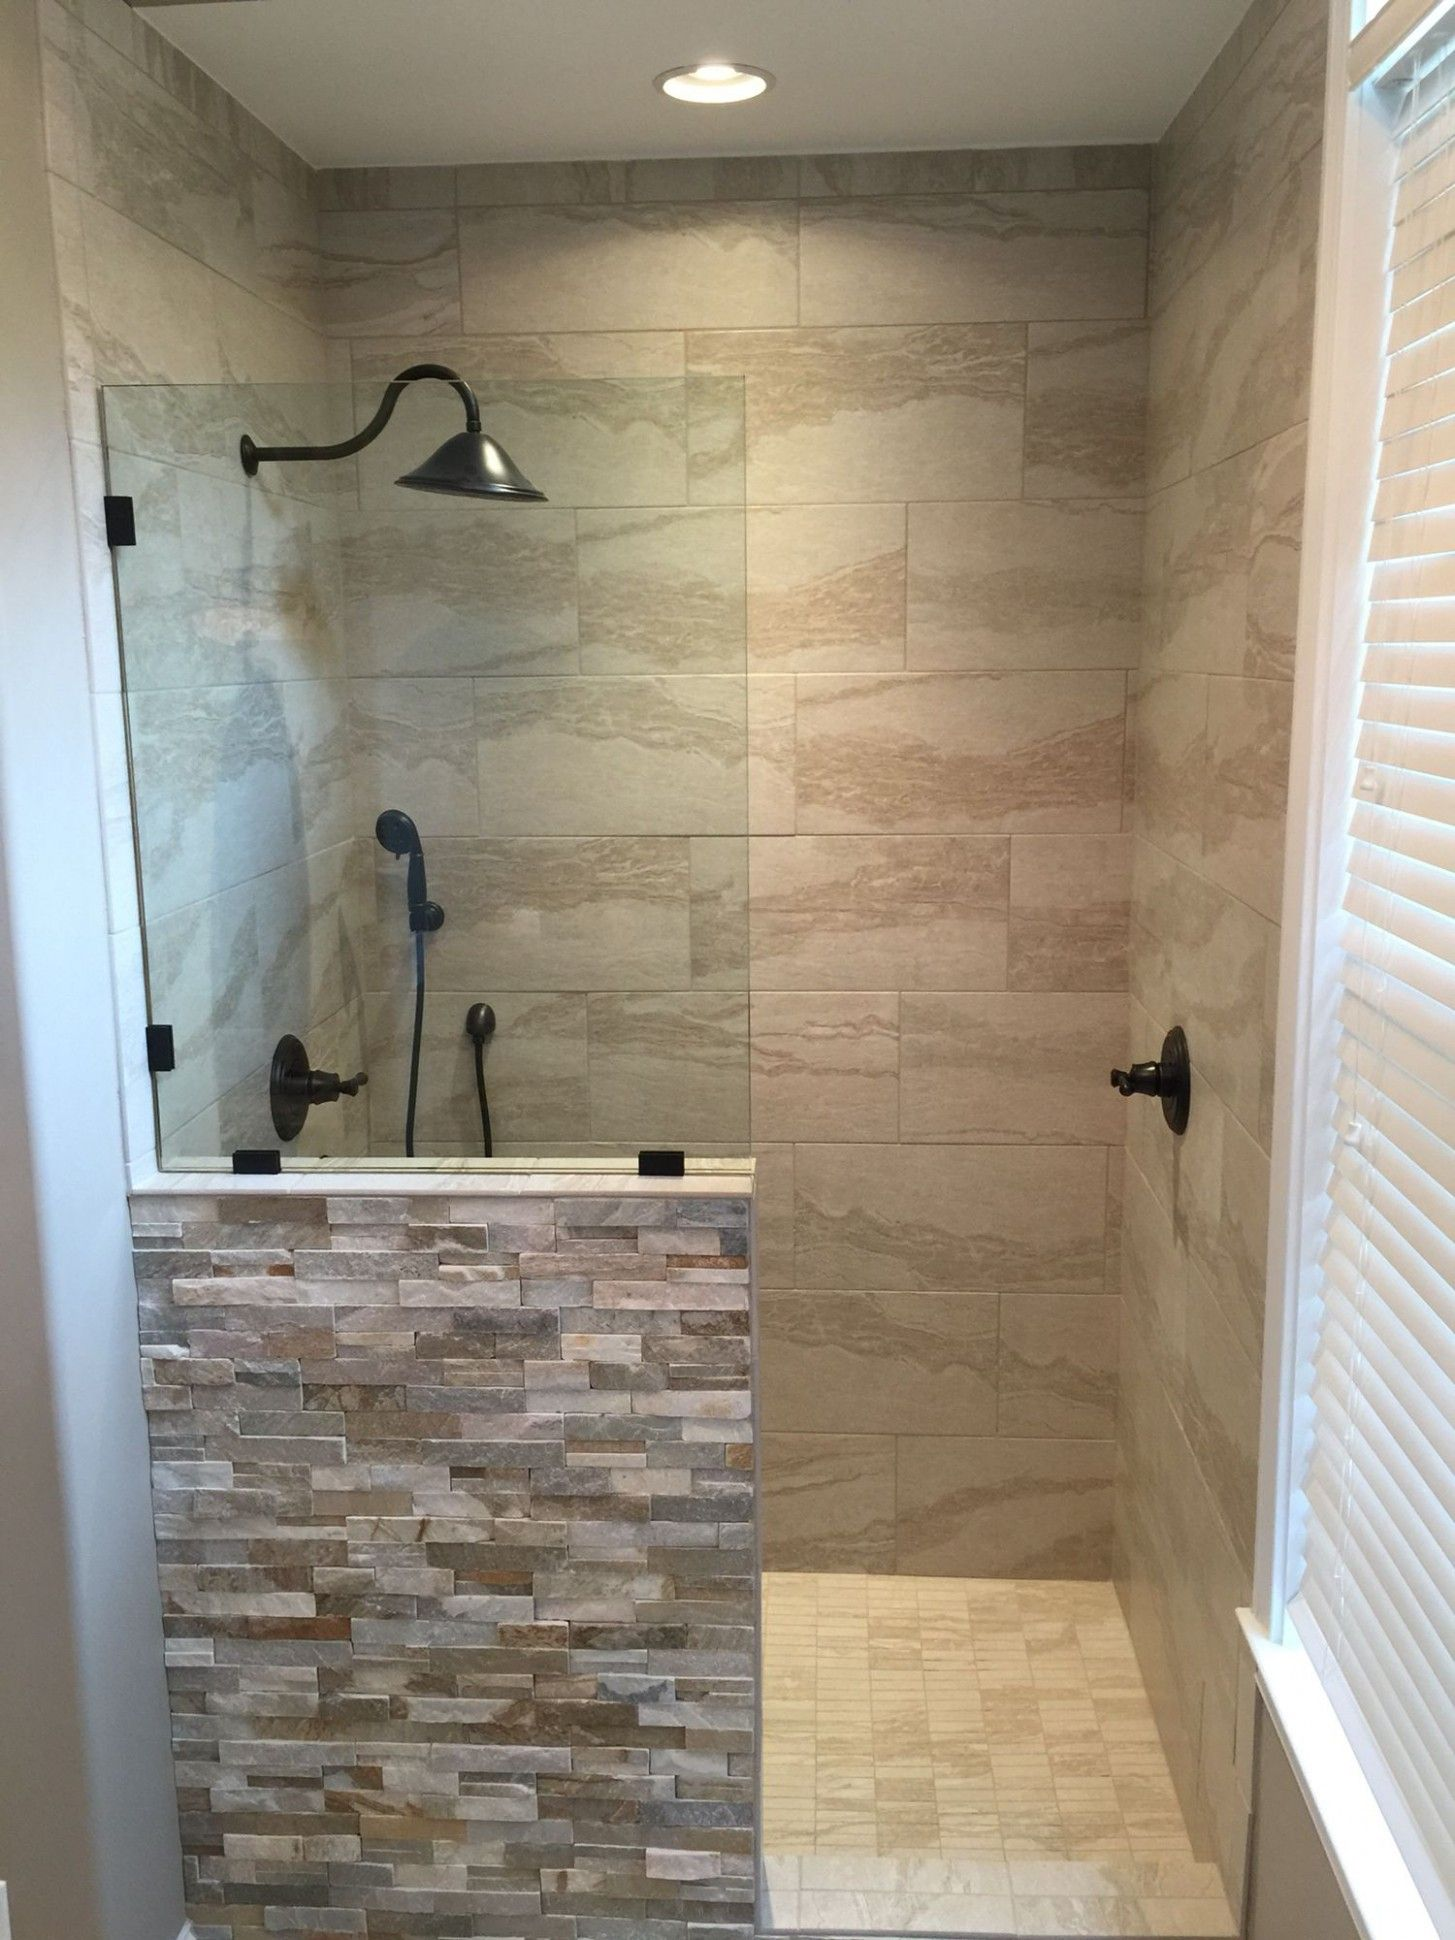 Bathroom Shower Ideas With Half Wall Small Bathroom Plans Bathroom Design Small Bathroom Makeover